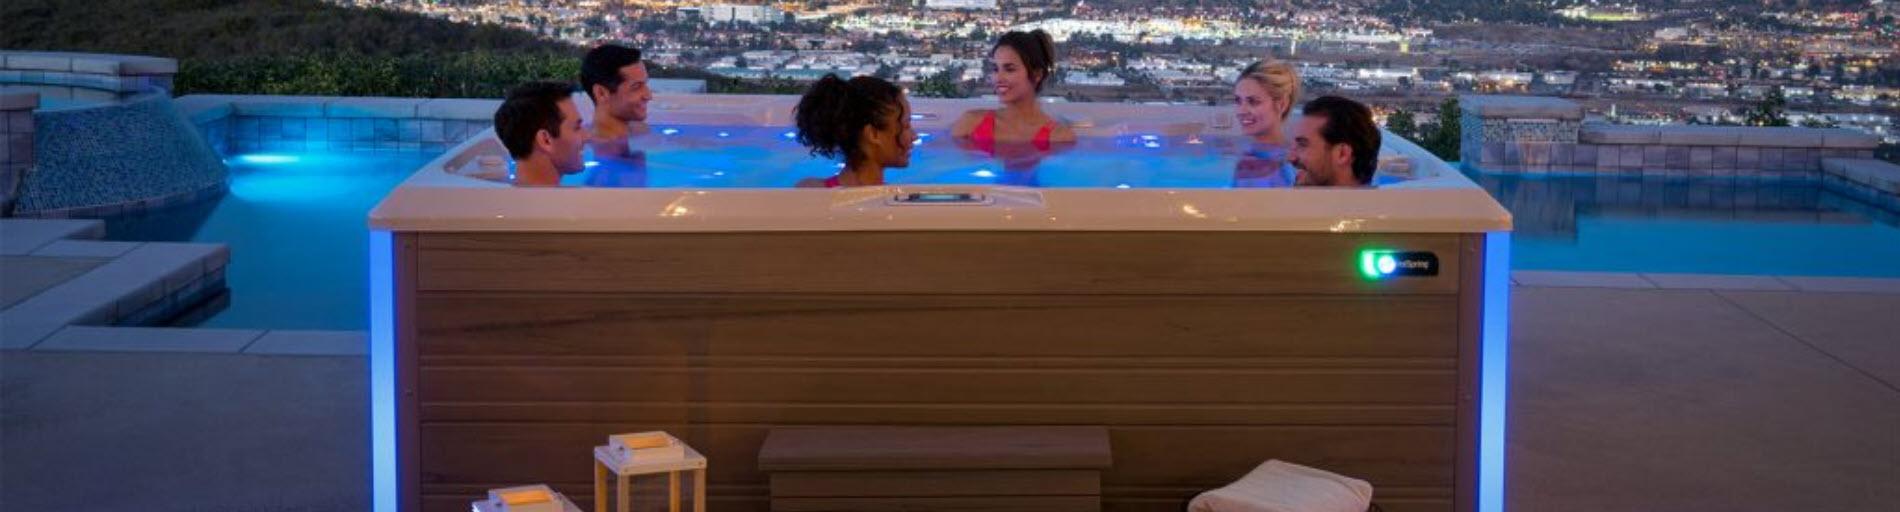 The Savviest Staycation Ever – Your Backyard Spa, Hot Tub Sale Iowa